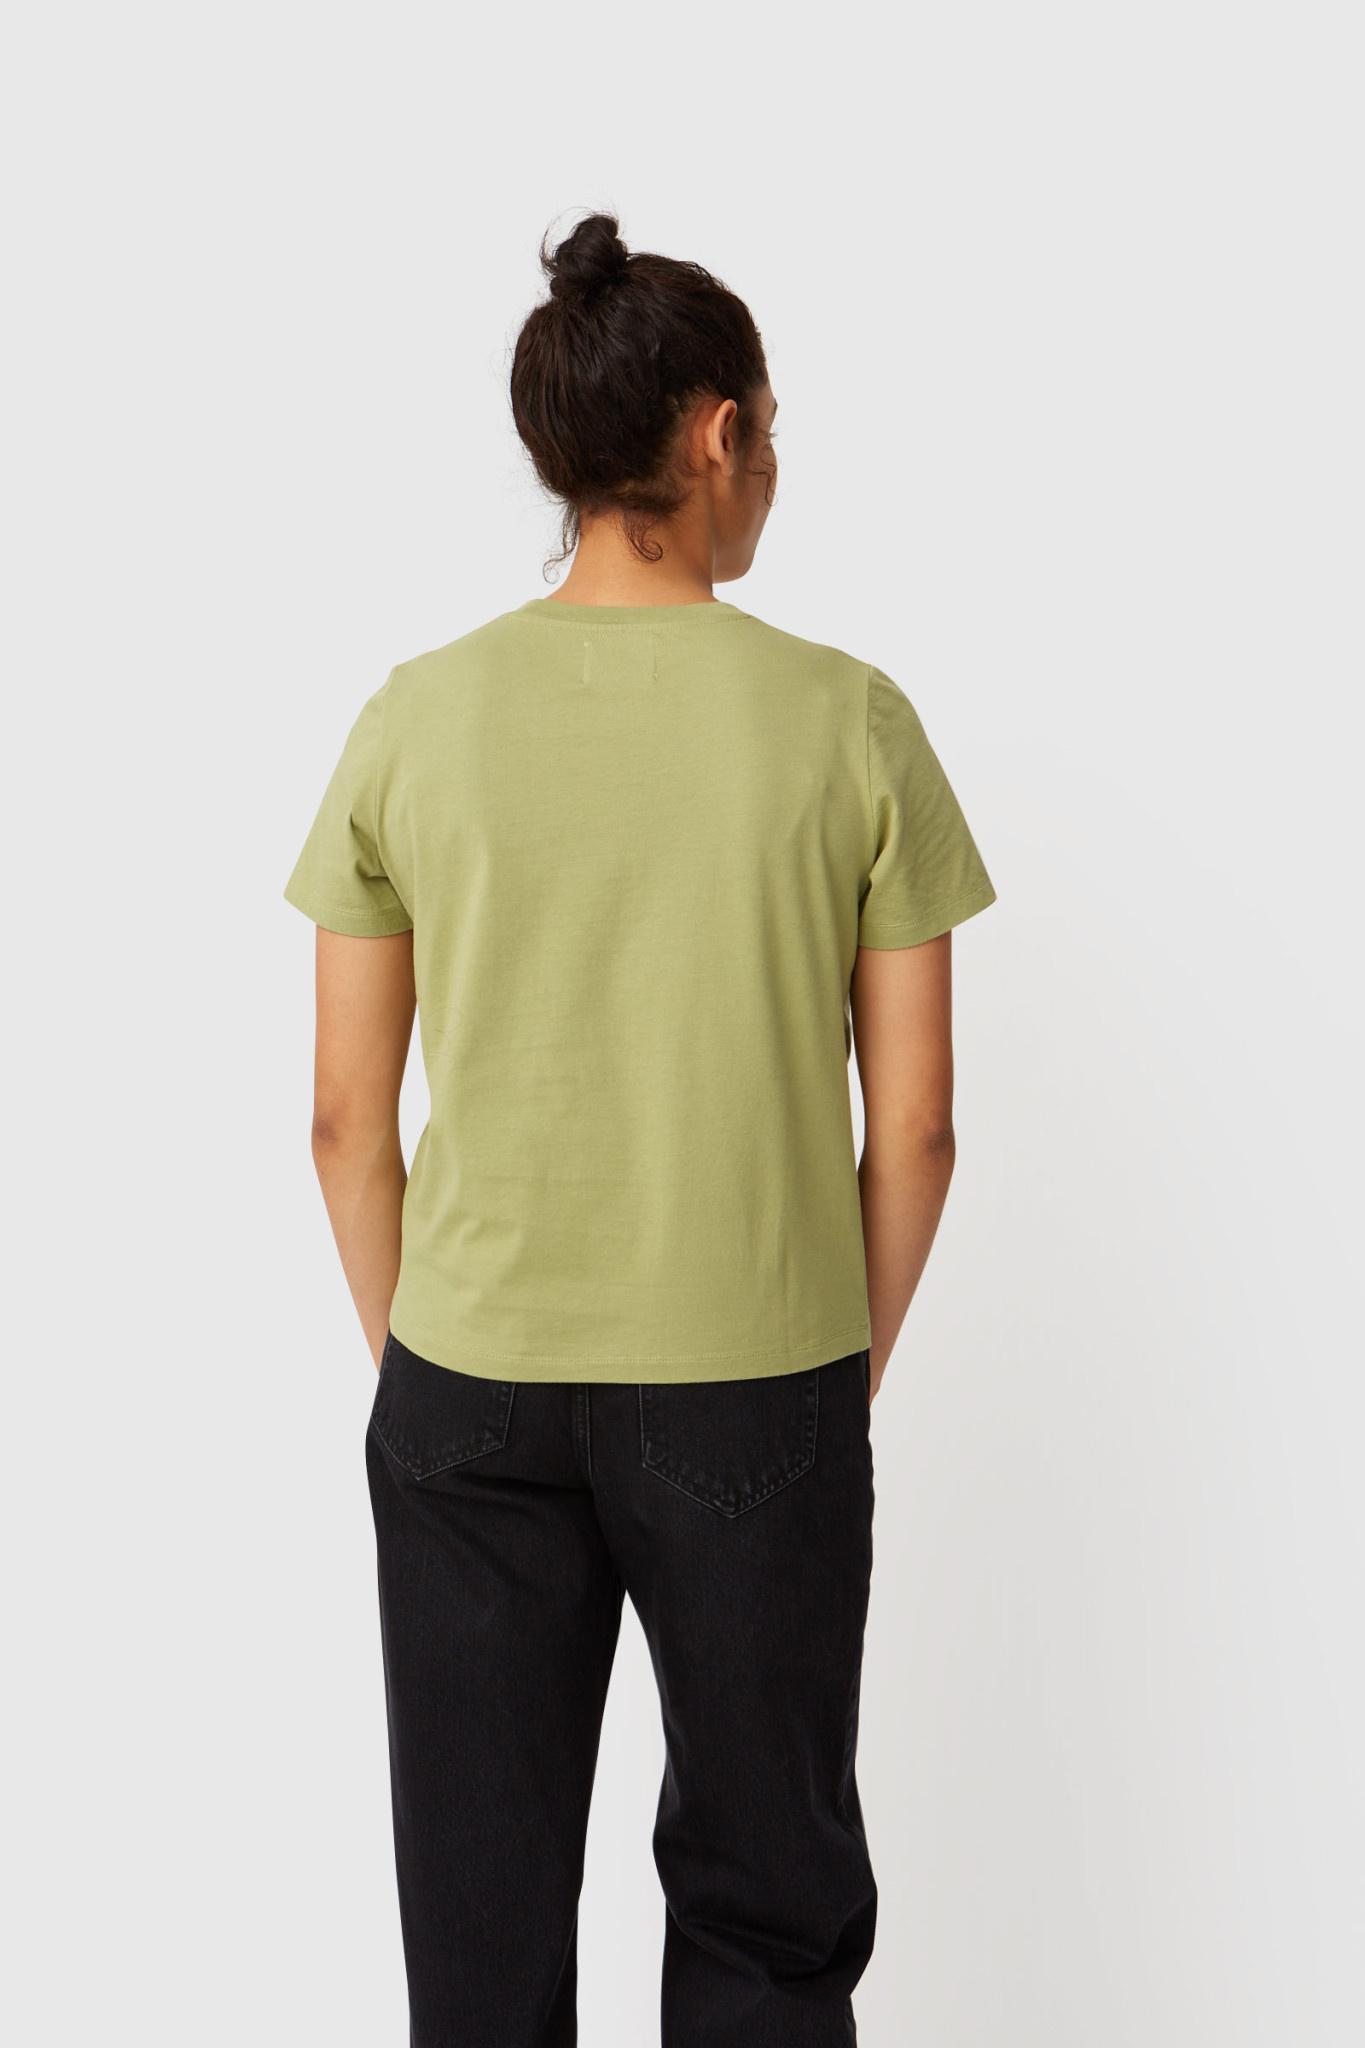 Mia Olive Green T-Shirt-3